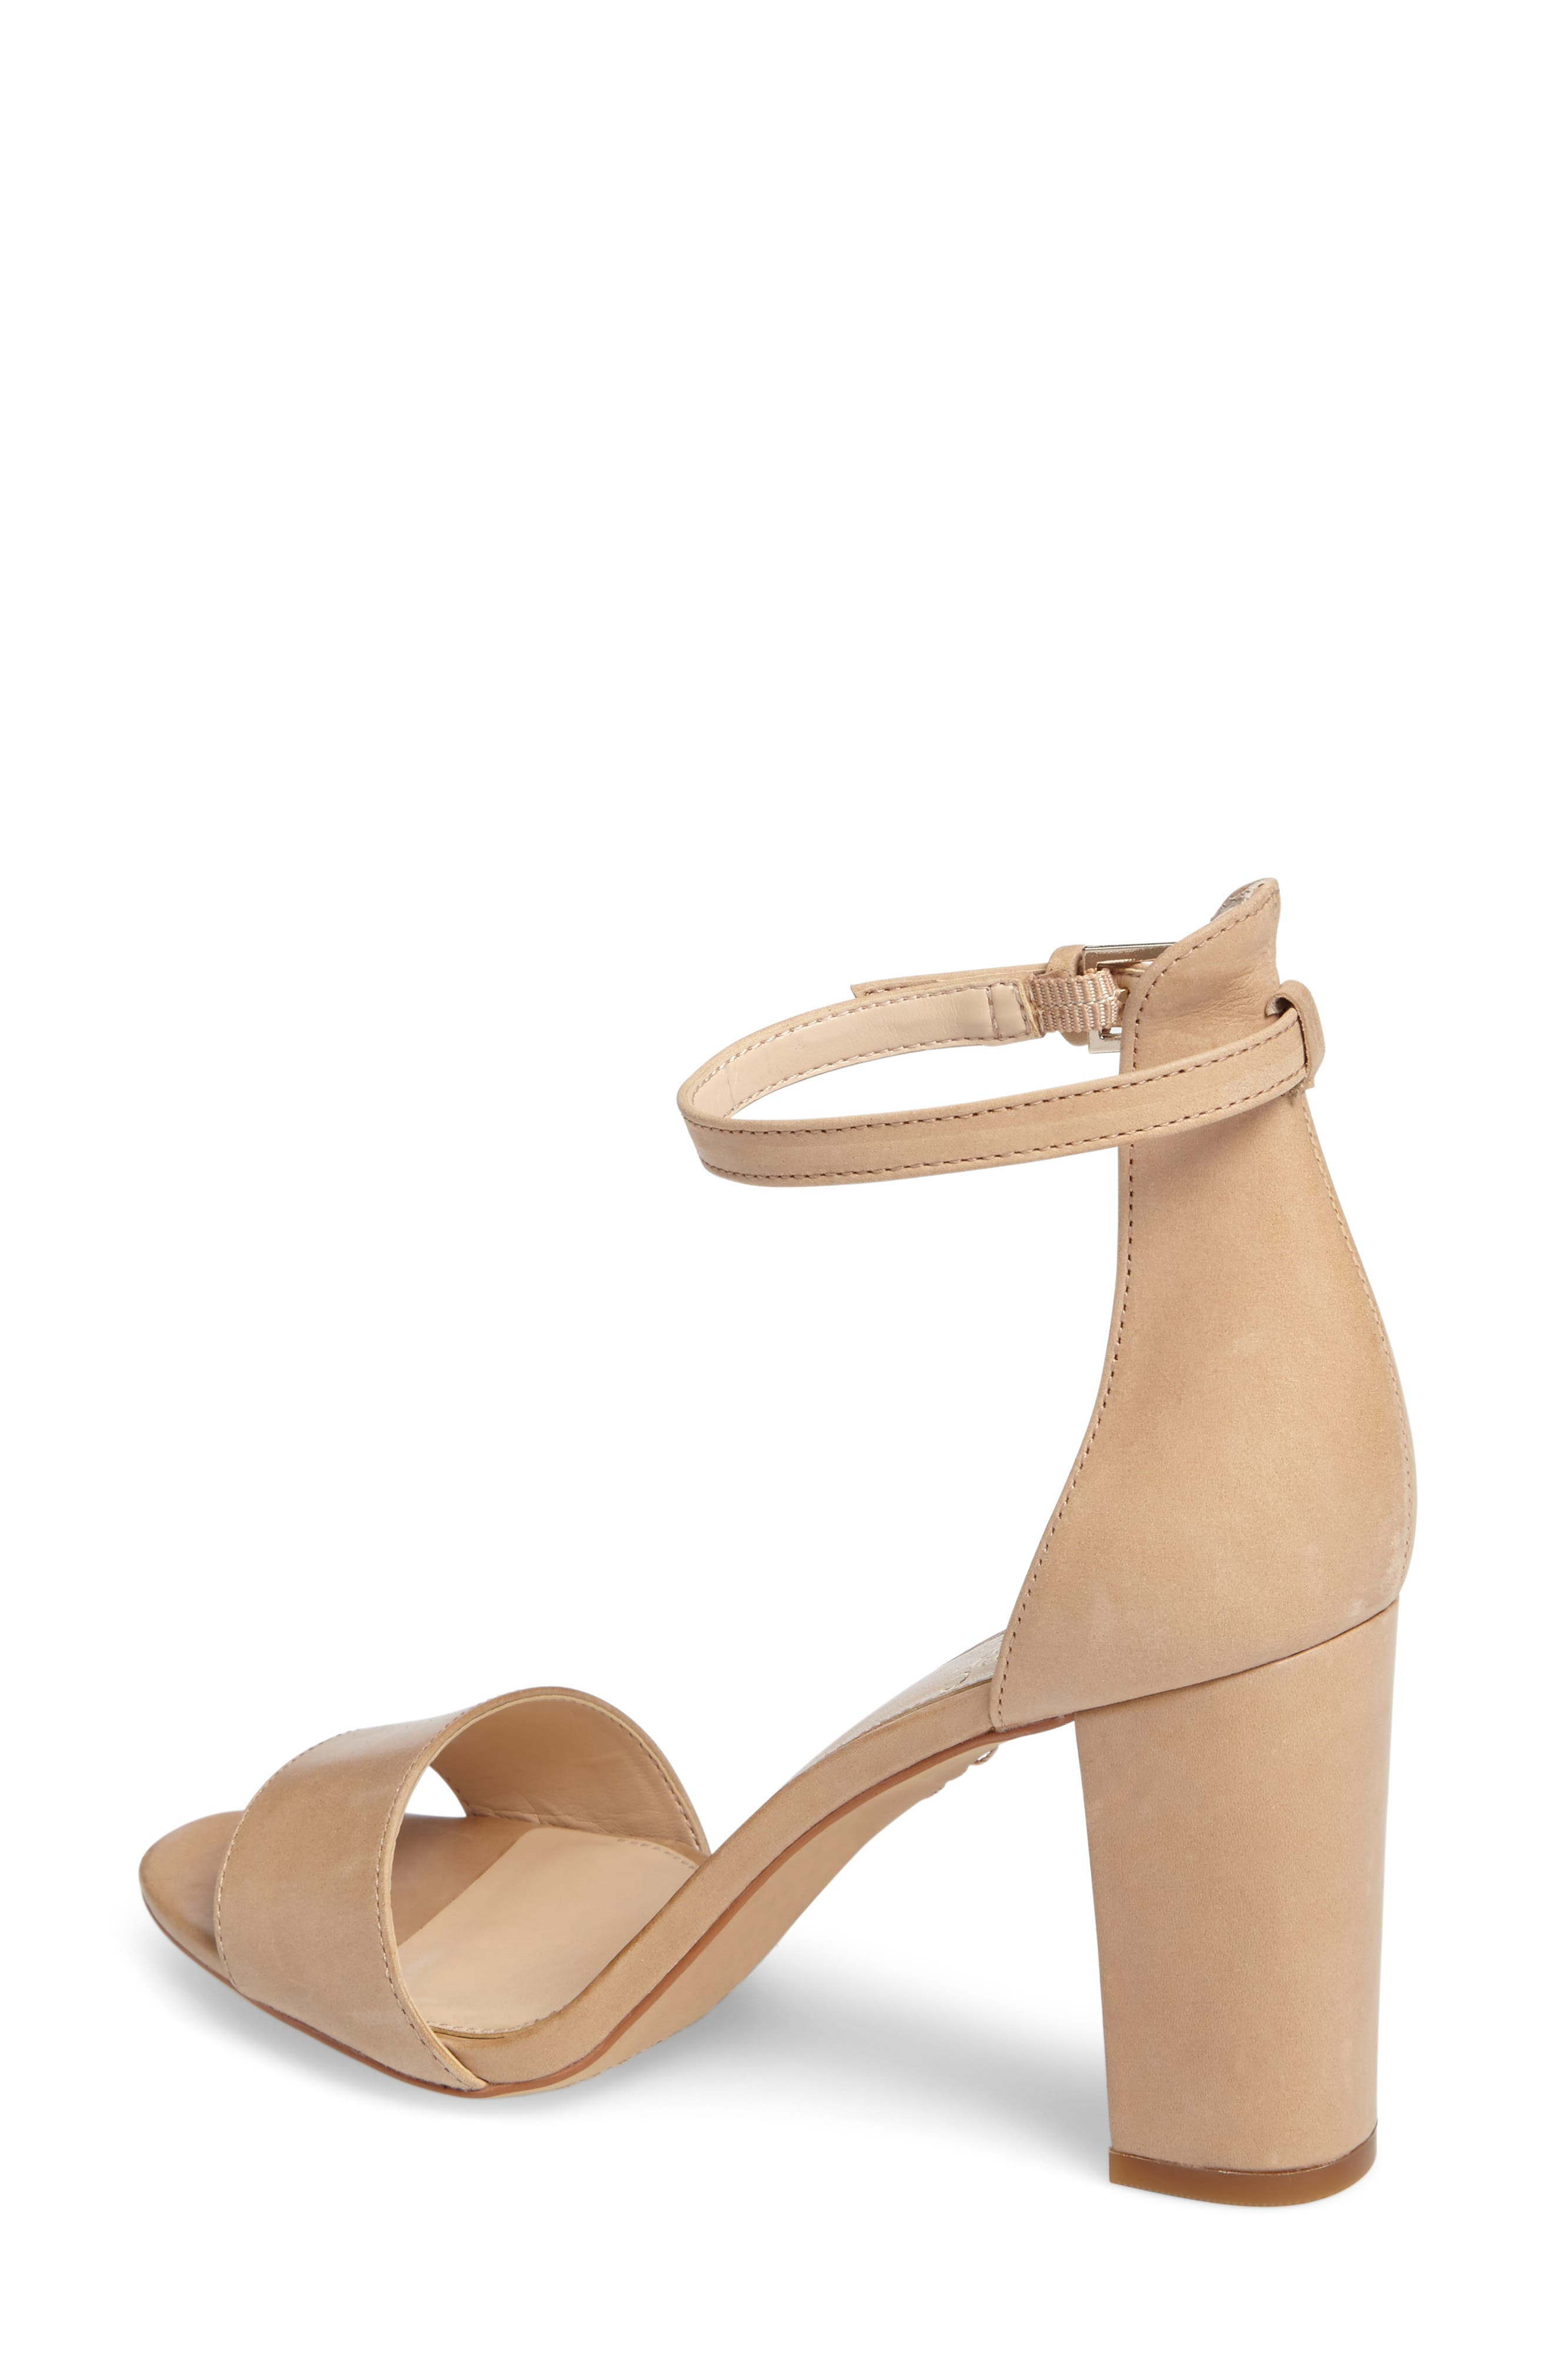 Alternate Image 2  - Vince Camuto Corlina Ankle Strap Sandal (Women) (Nordstrom Exclusive)